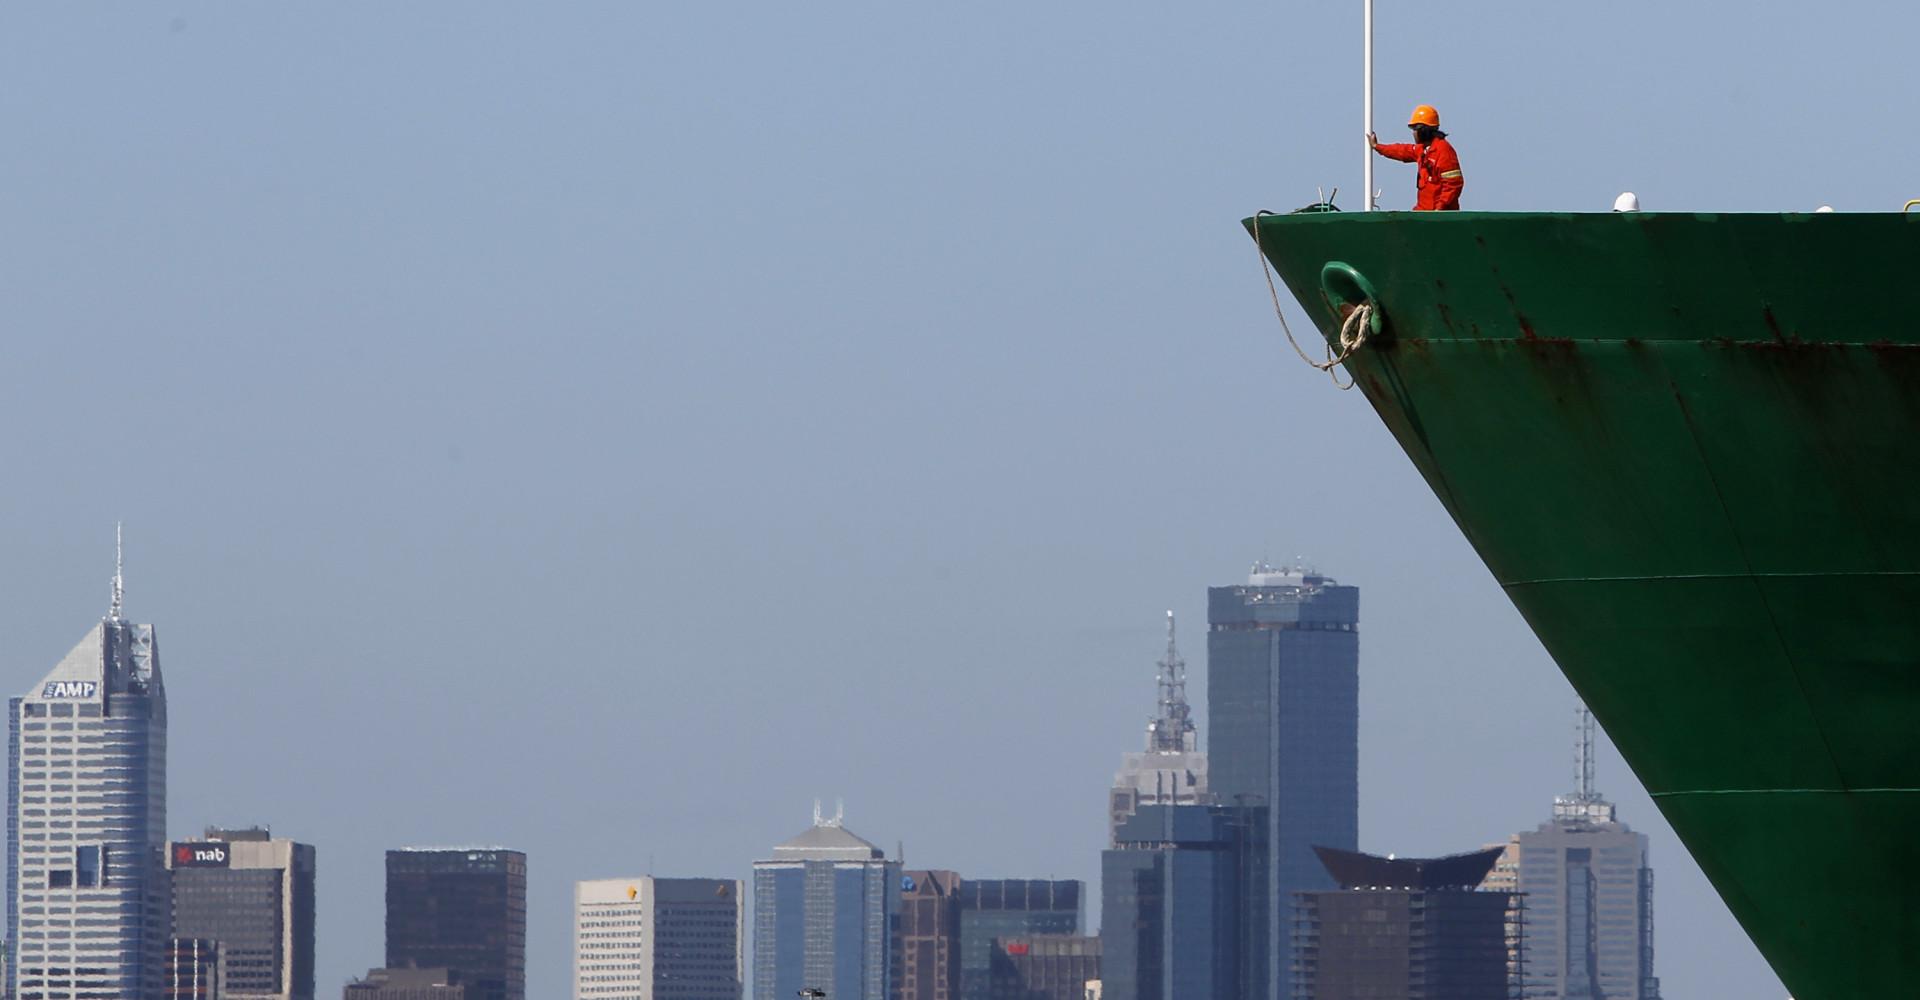 Australia's largest trading partners